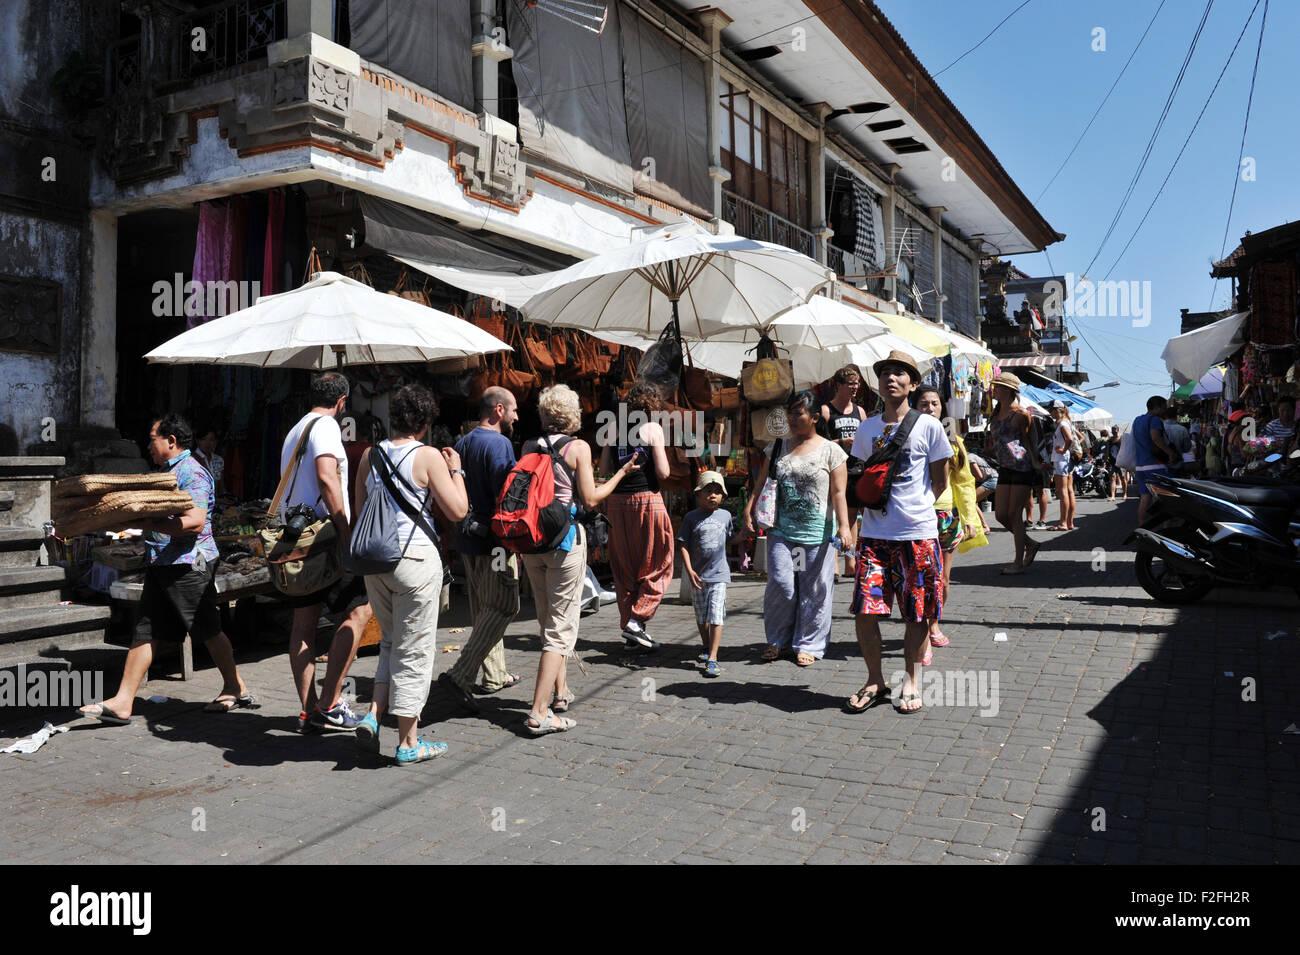 tourist on the street at Ubud Market - Stock Image